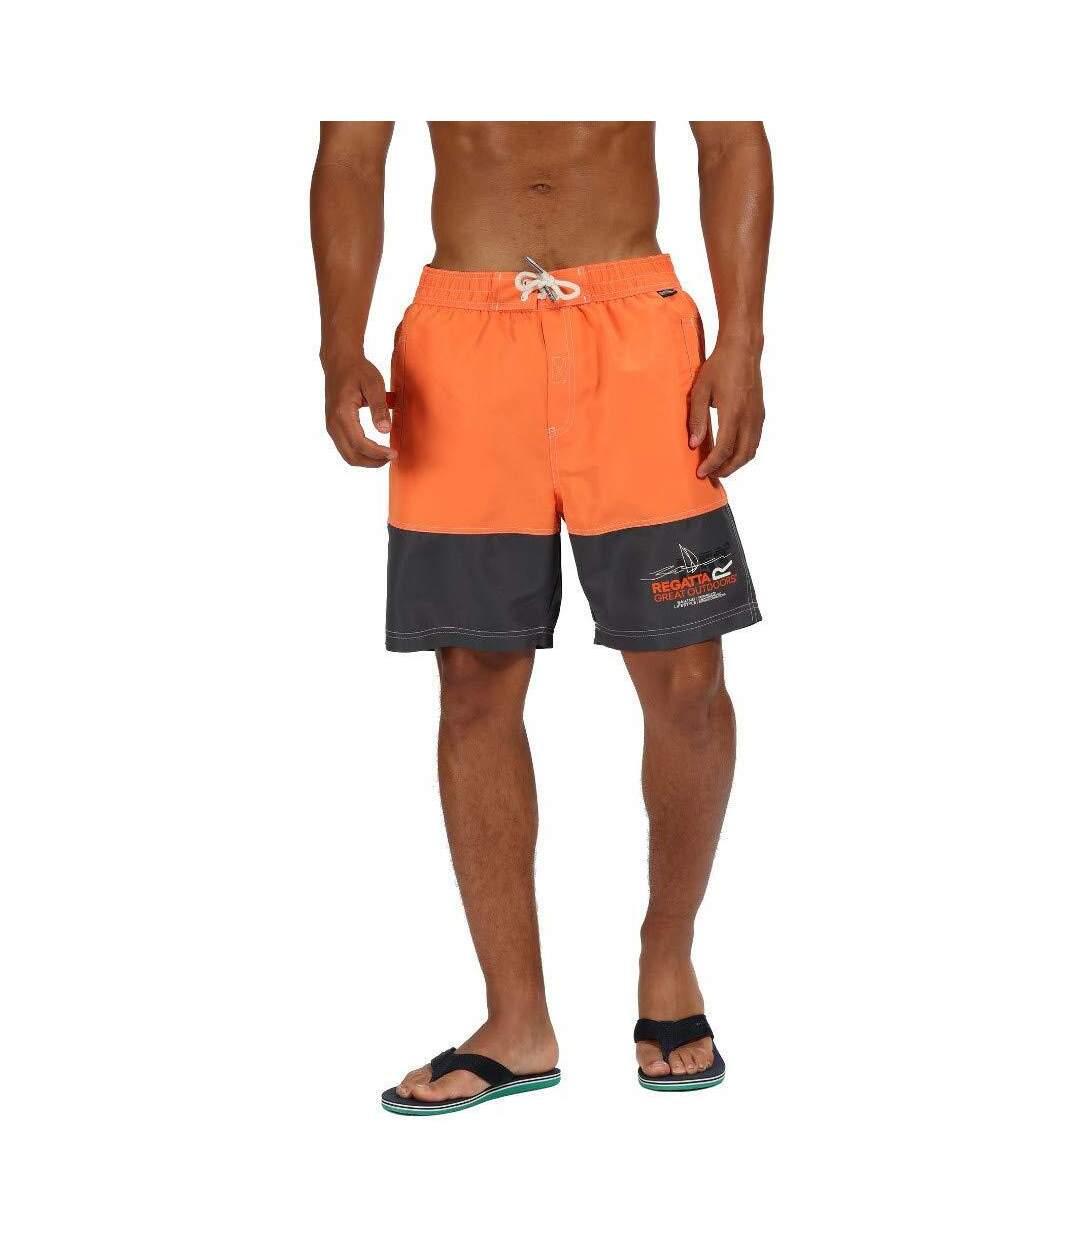 Regatta Mens Bratchmar III Quick Drying Swim Shorts (Blaze Orange/Seal Grey) - UTRG4173